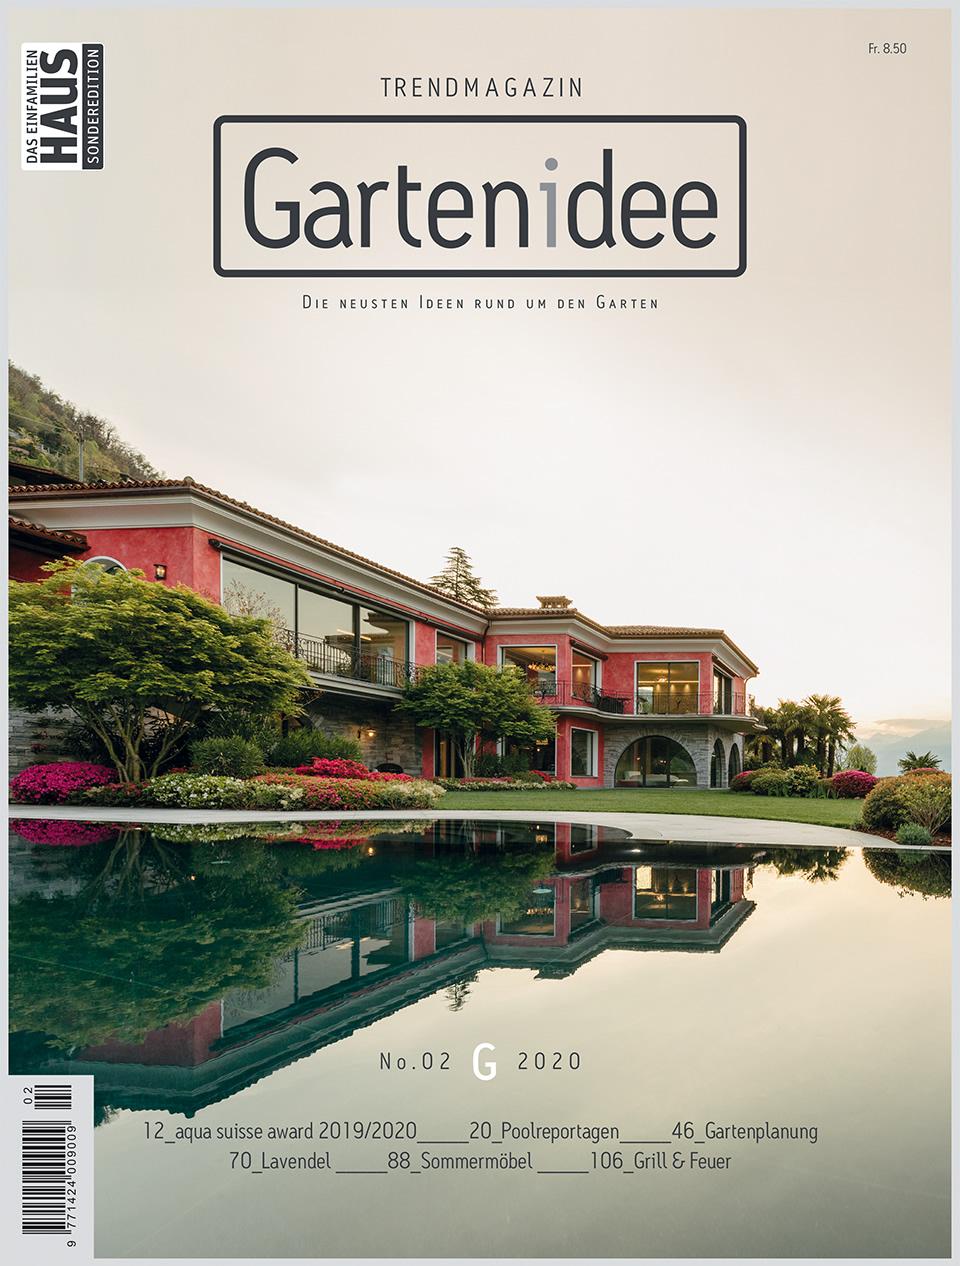 Trendmagazin Gartenidee